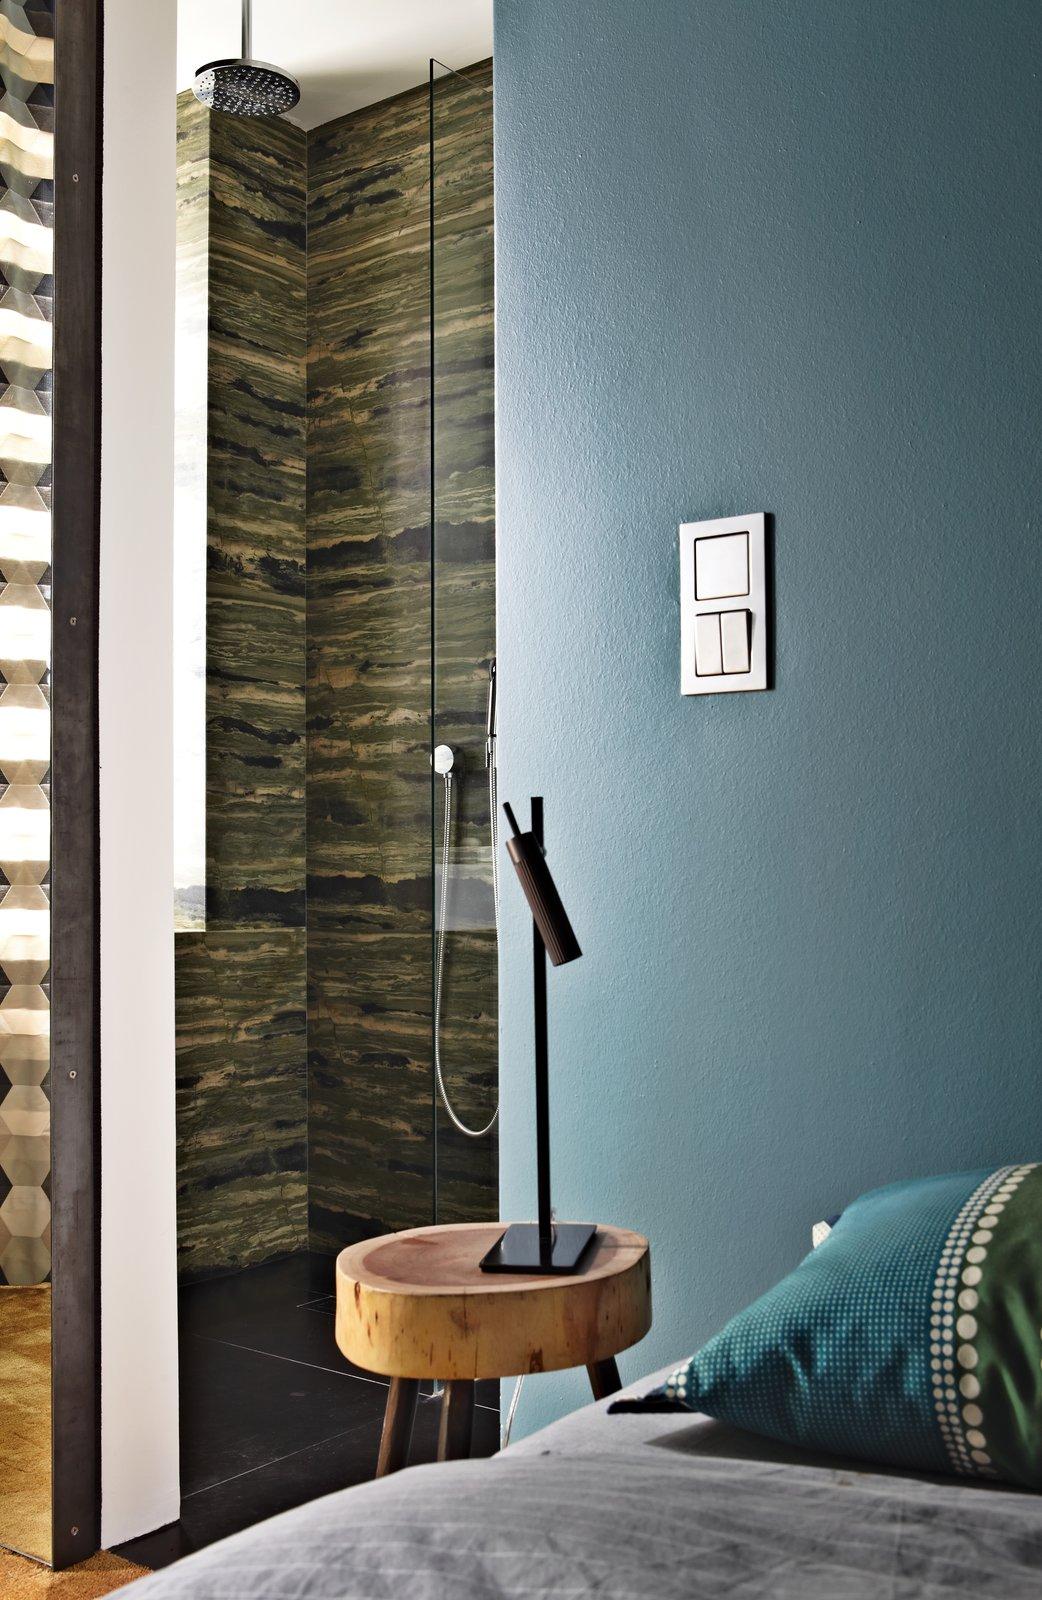 A sliding door divides the verde bamboo granite bathroom from the bedroom.  127+ Inspiring Interior Ideas from Inside Peter Fehrentz's Renovated Flat in Berlin